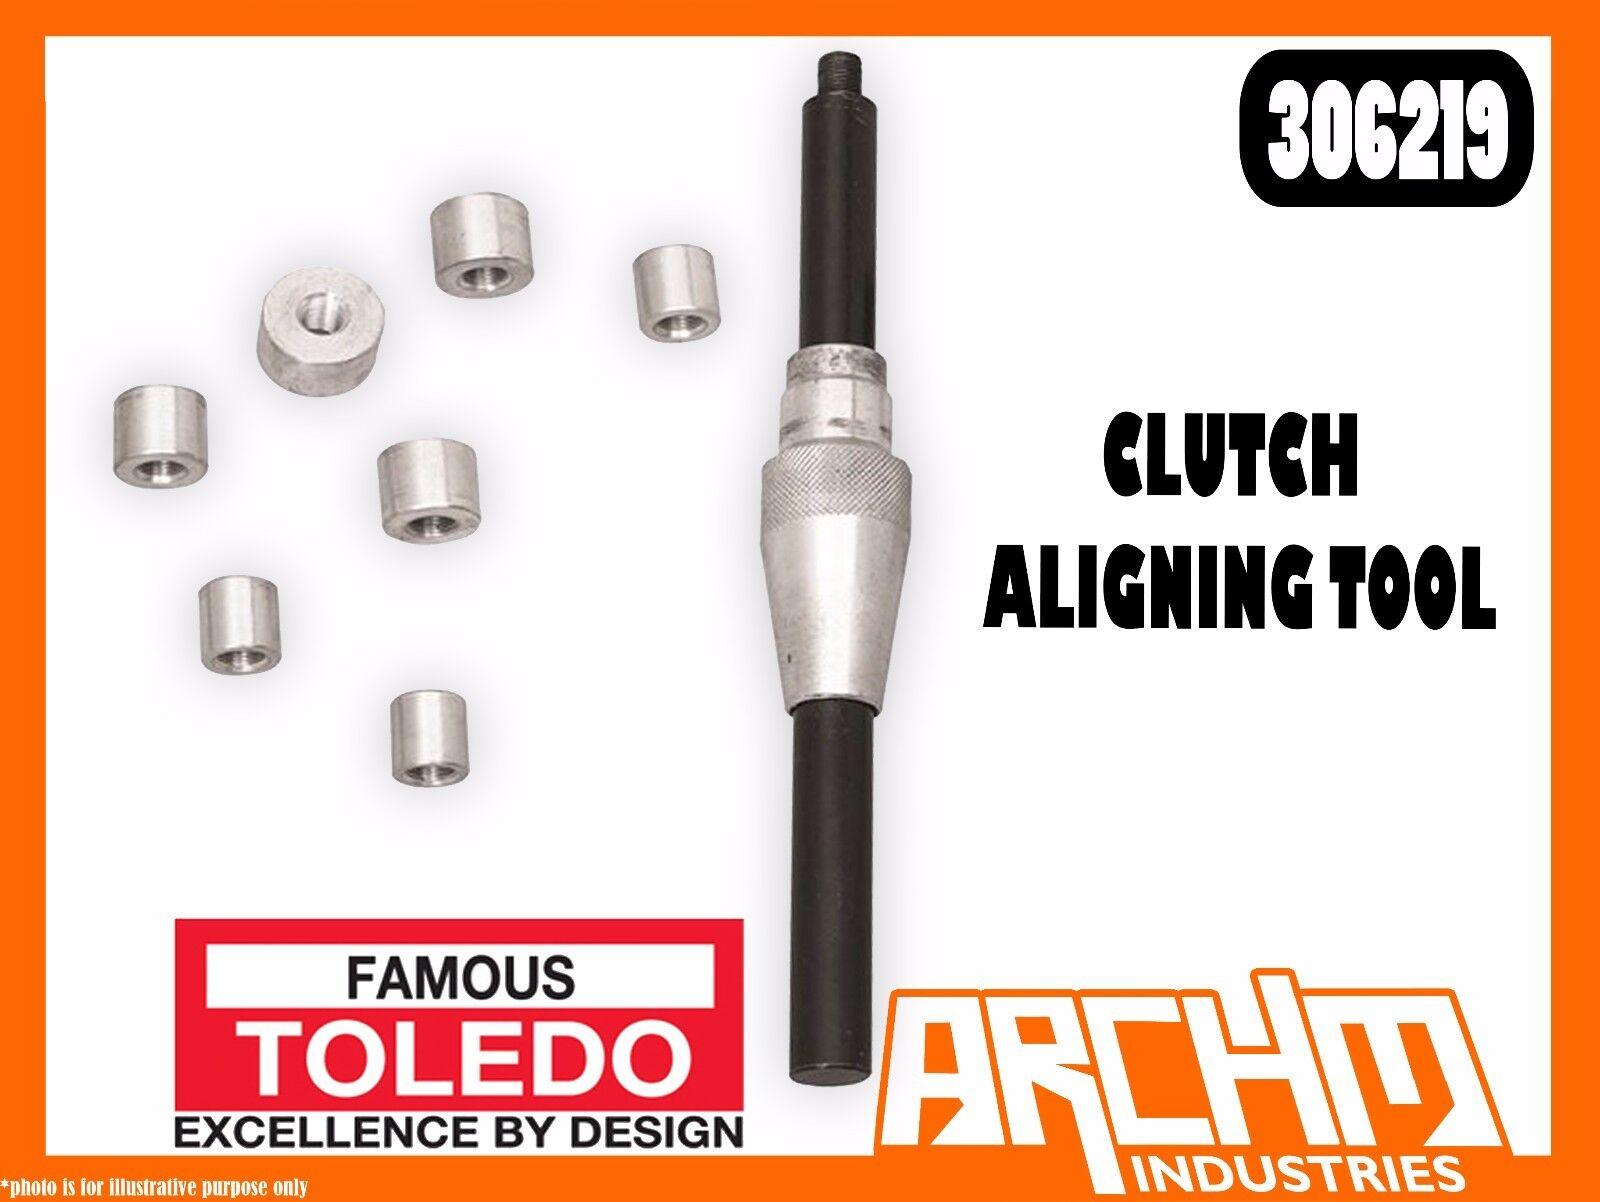 TOLEDO 306219 - CLUTCH ALIGNING TOOL - 15, 16, 17, 19, 20, 21, 25MM ADAPTORS